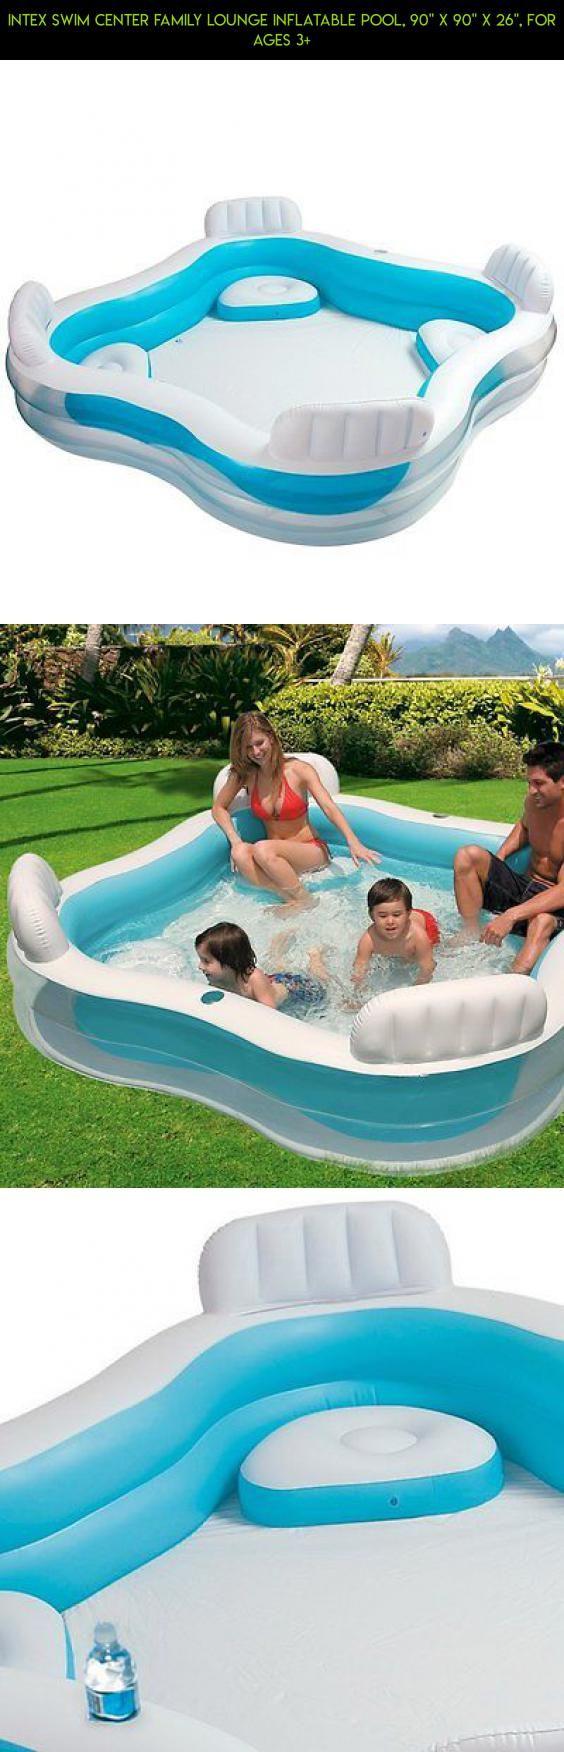 25 best ideas about intex swimming pool on pinterest - Intex swim center family lounge pool blue ...